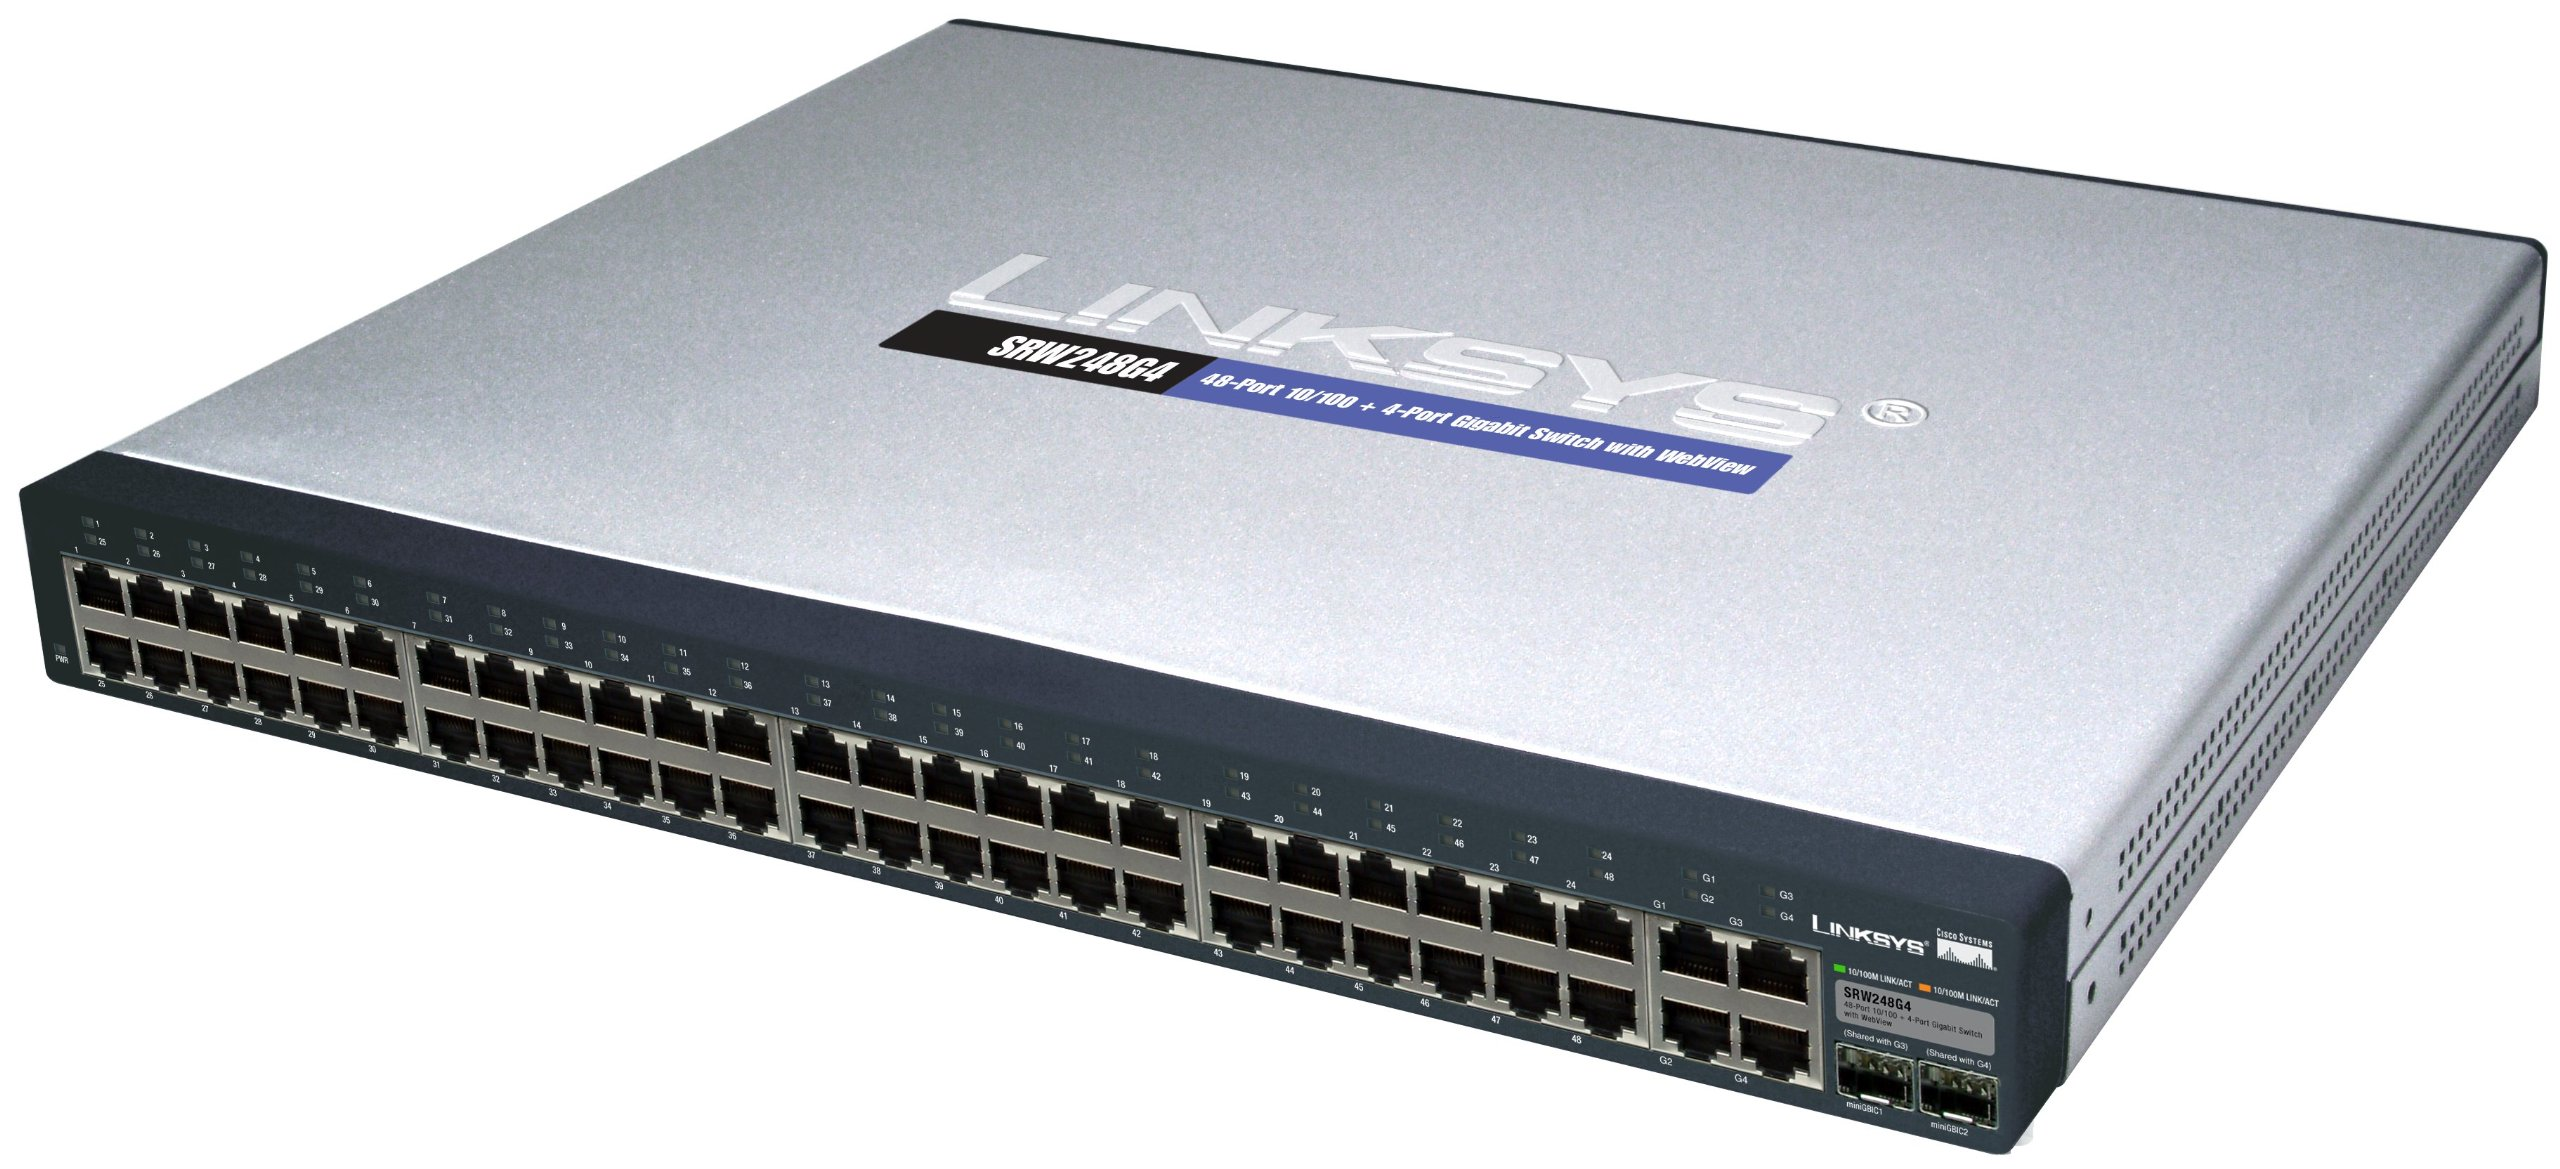 Cisco SRW248G4 48-port 10/100 + 4-port Gigabit Switch - WebView